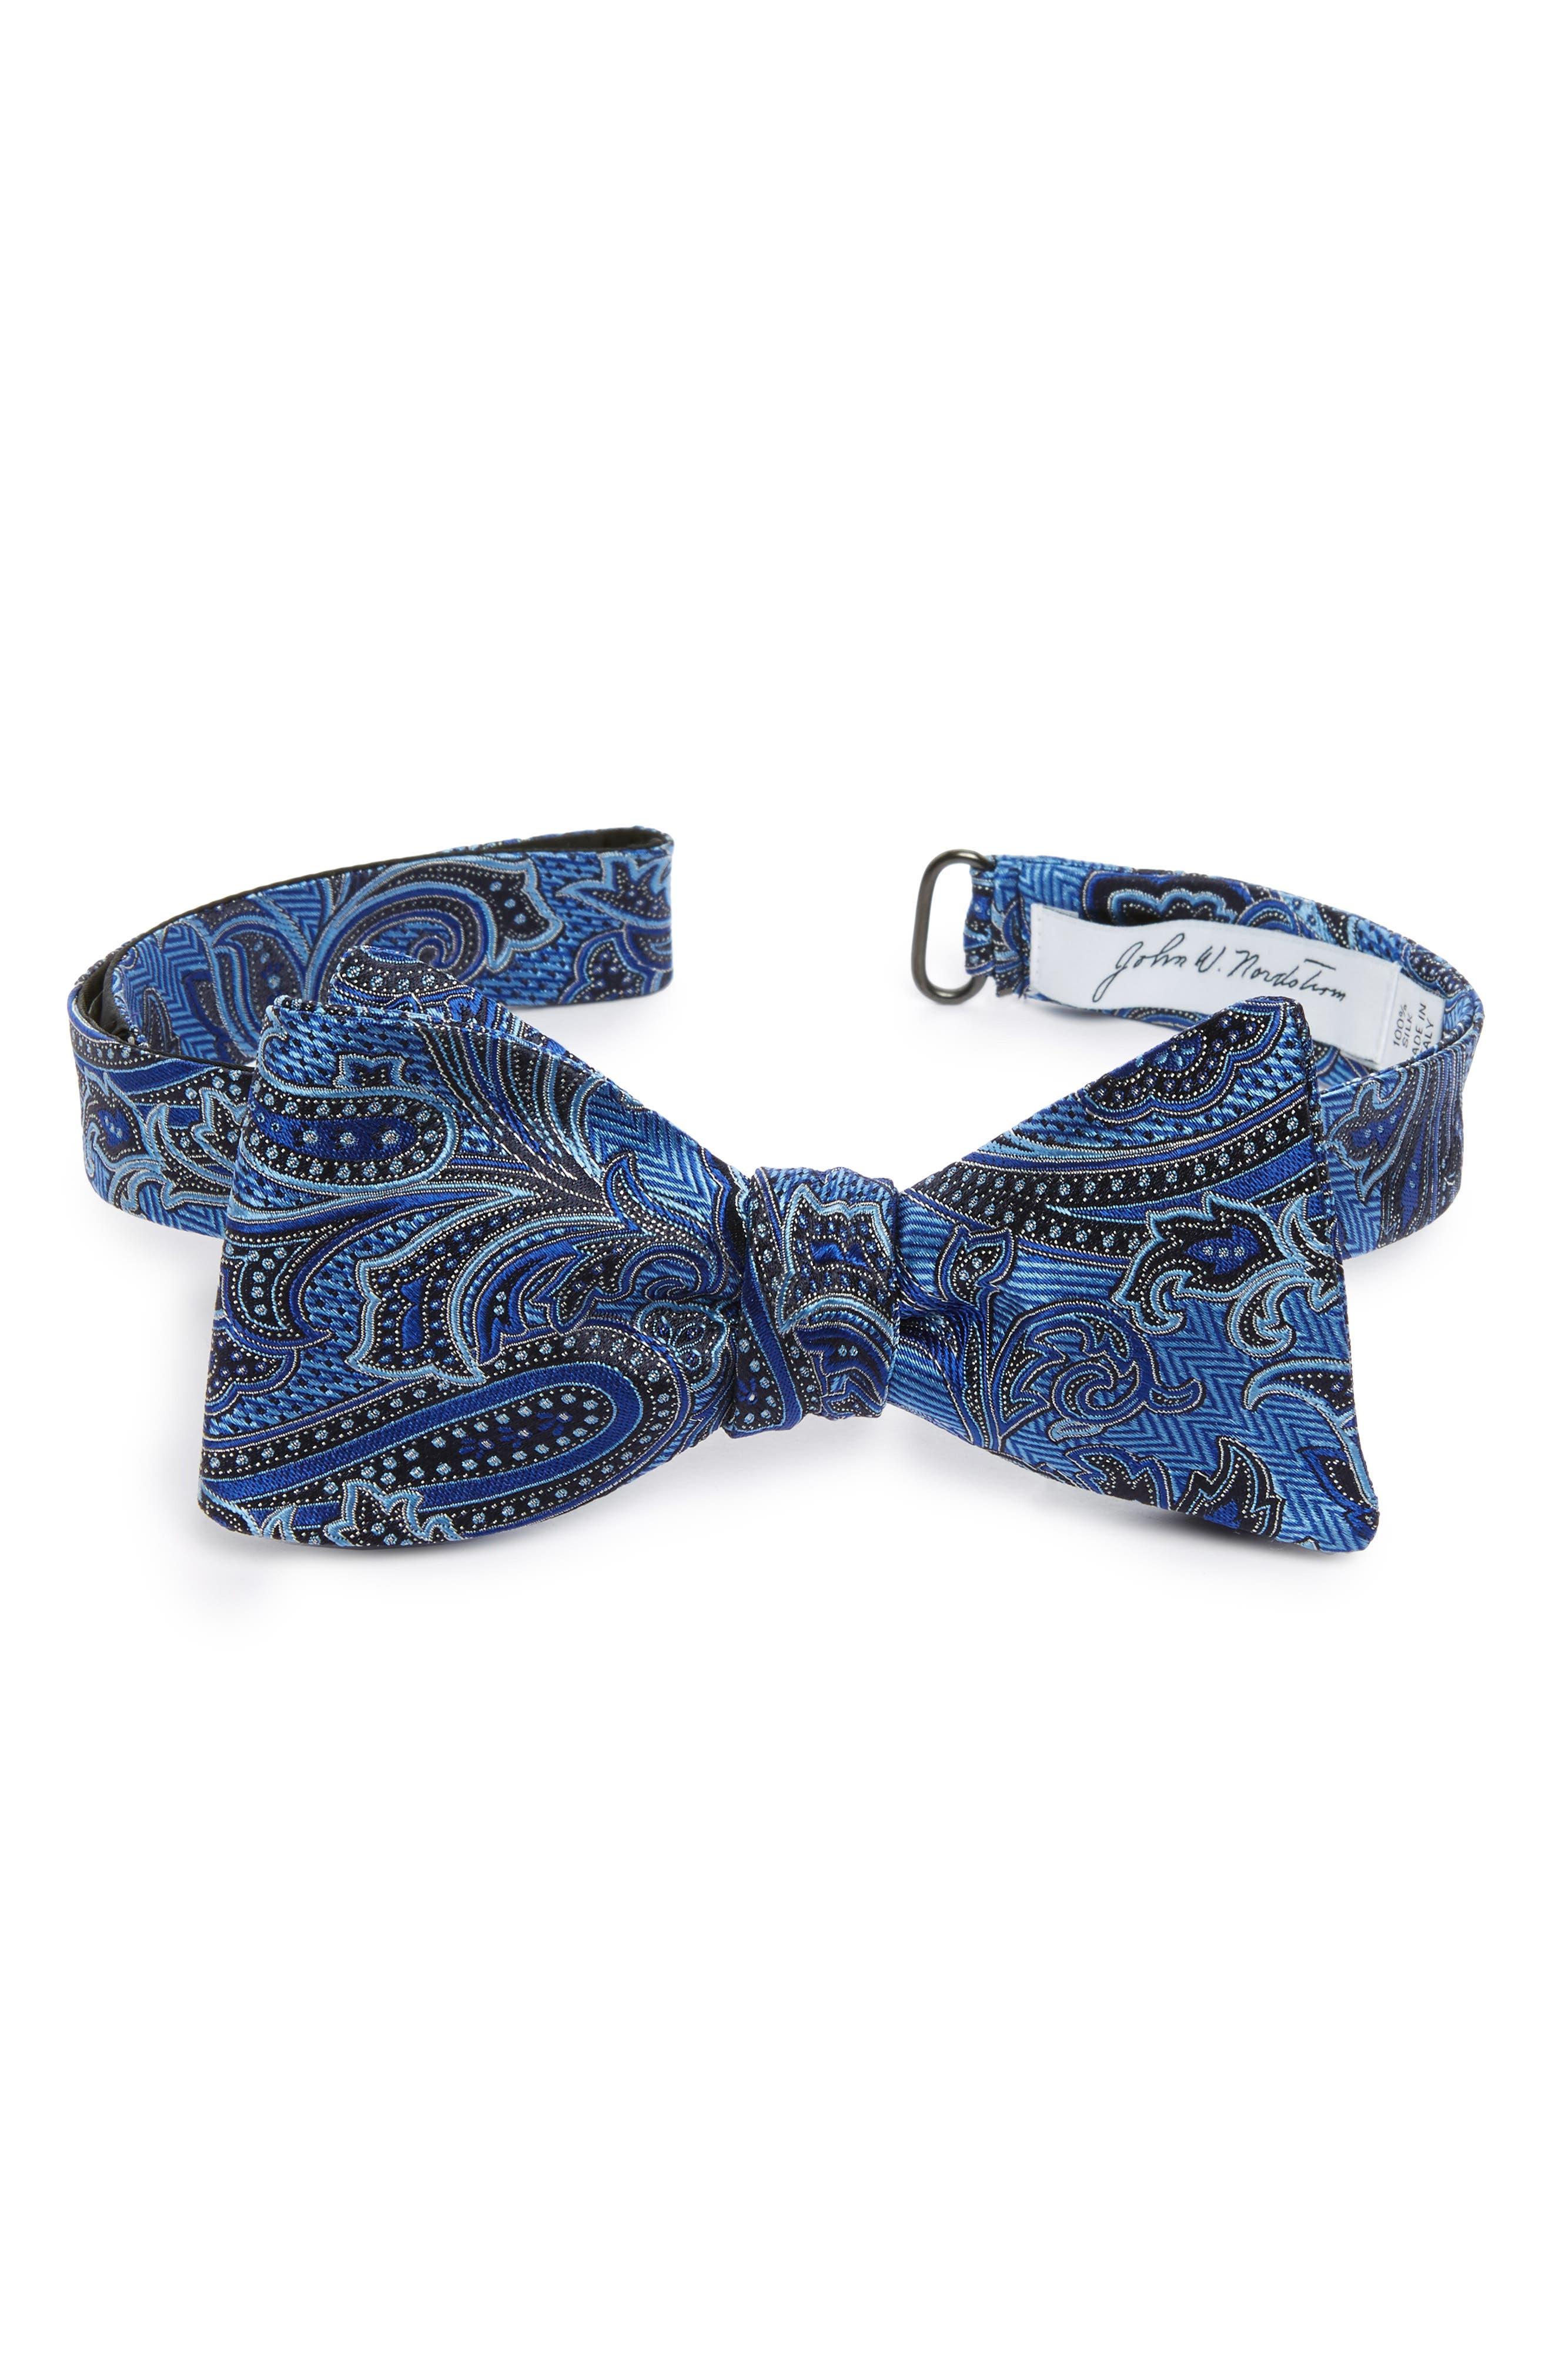 Main Image - John W. Nordstrom® Paisley Silk Bow Tie